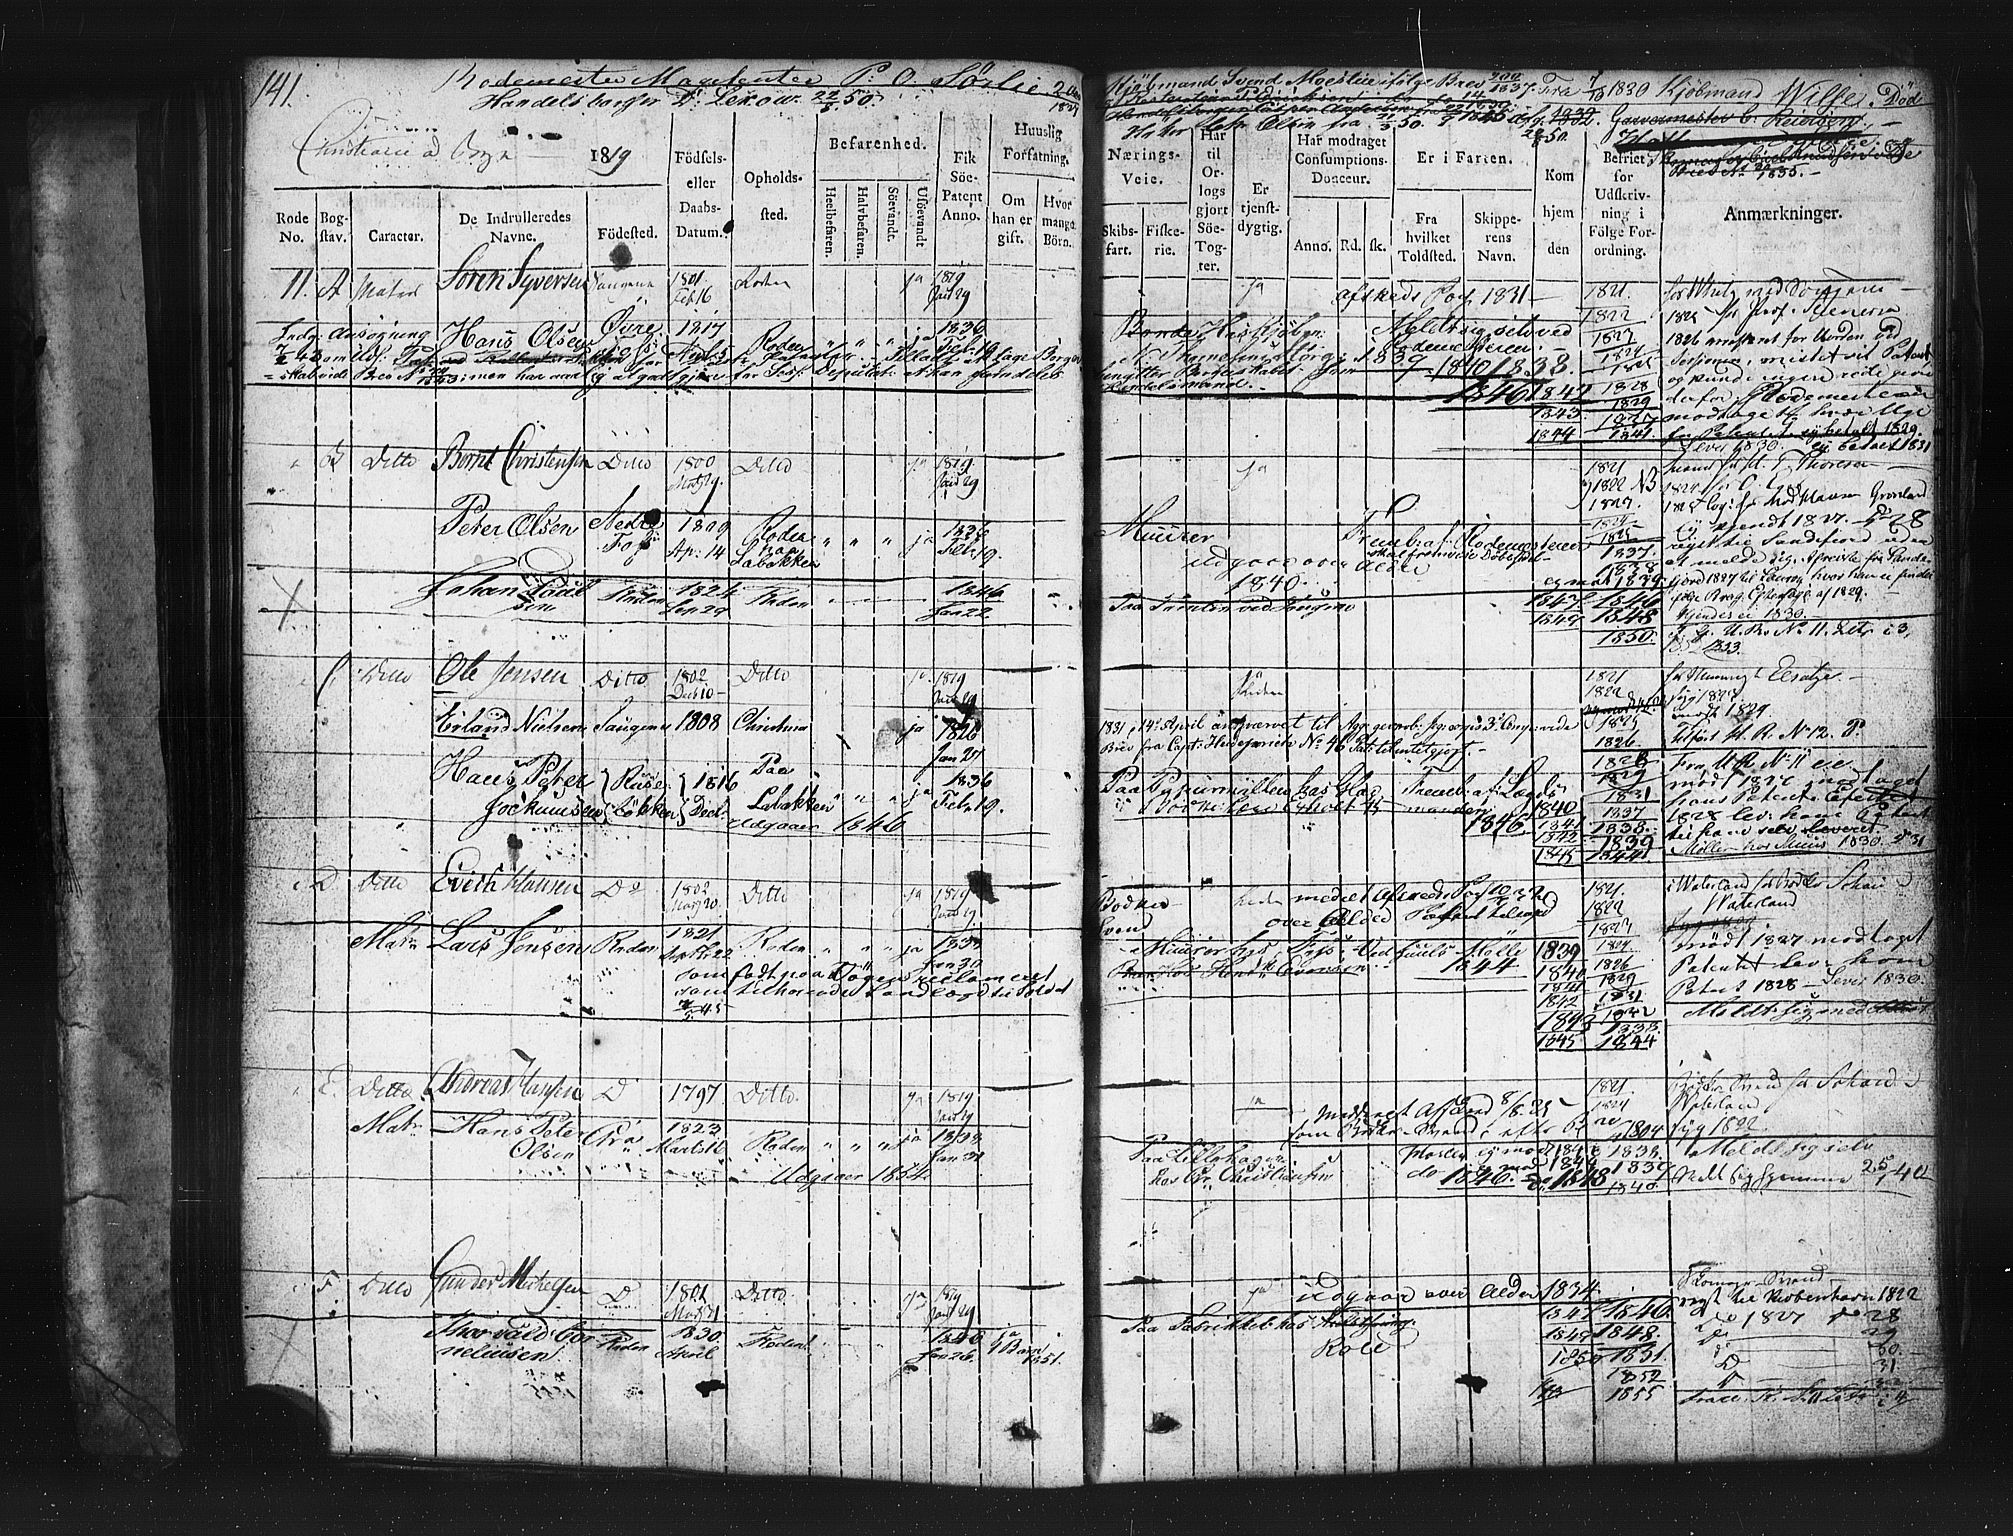 SAO, Oslo mønstringskontor, F/Fc/Fcb/L0001: Hovedrulle, 1819, s. 141